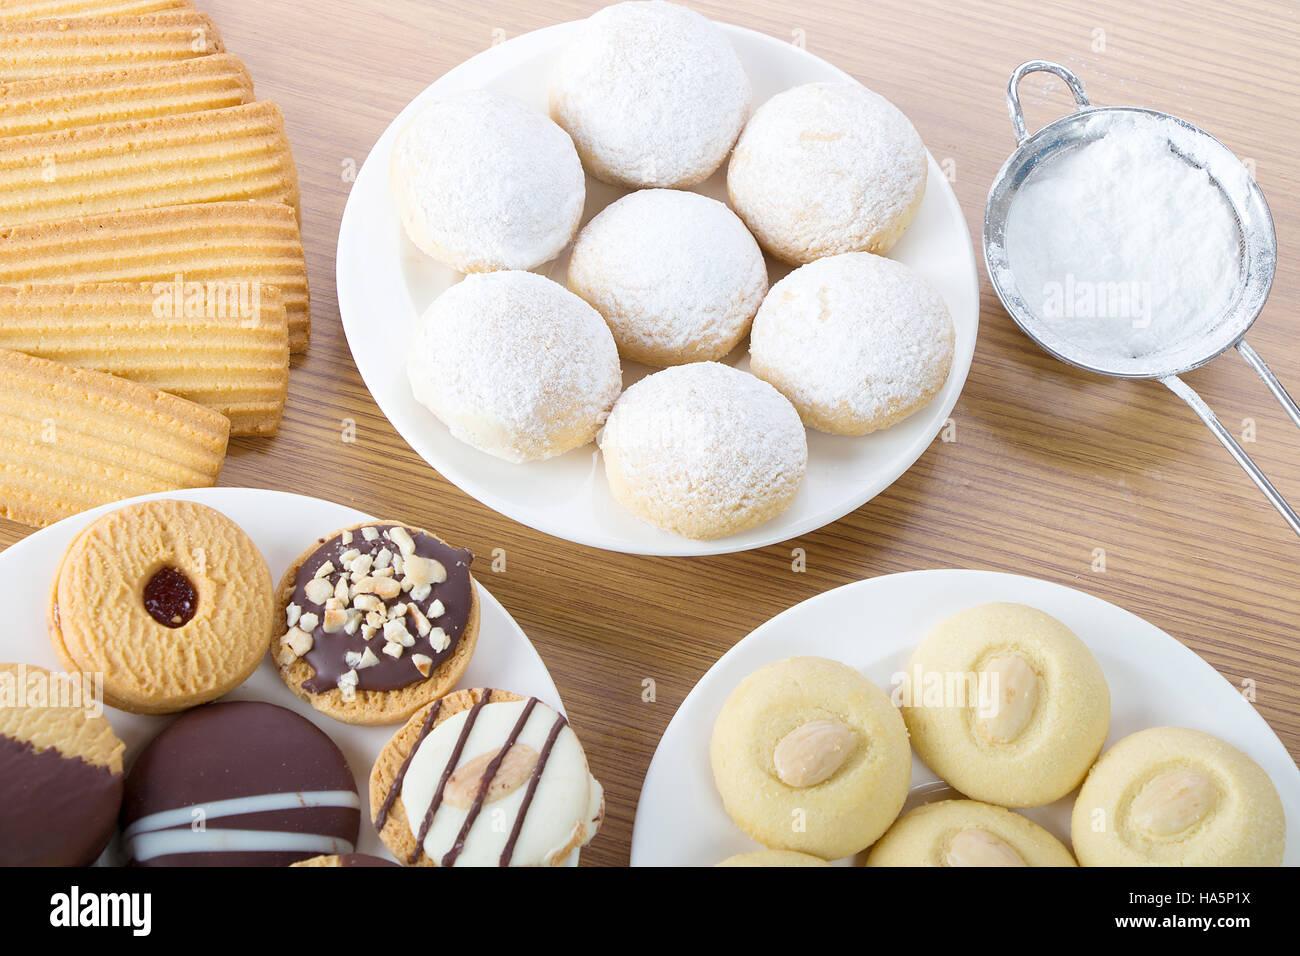 Eid El Fitr Cookies - Stock Image